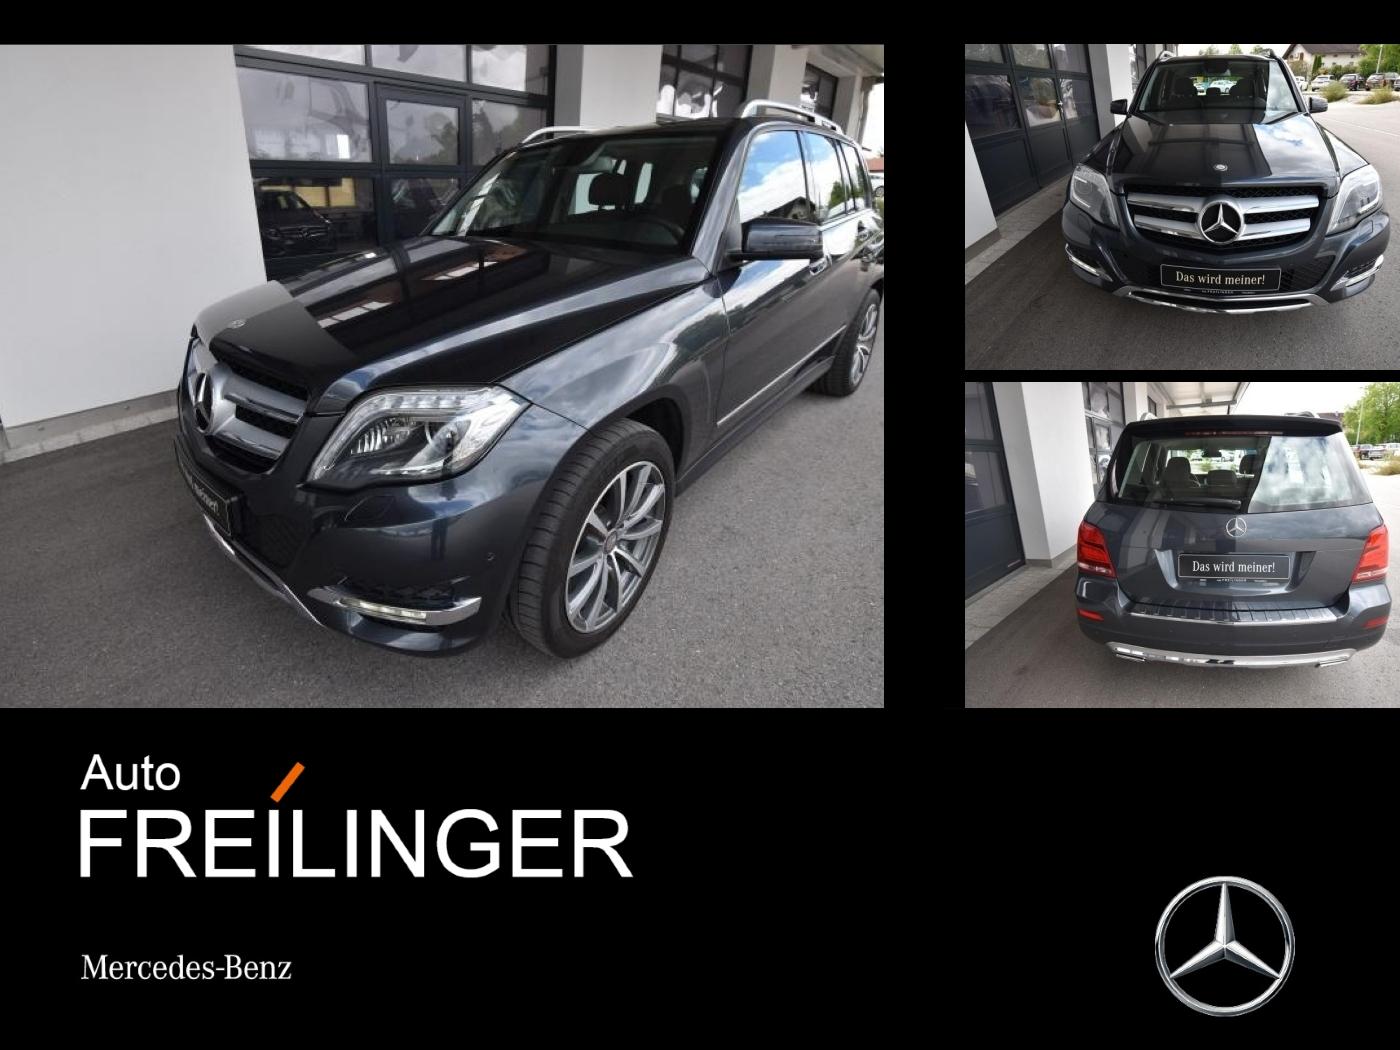 Mercedes-Benz GLK 350 CDI 4MATIC Comand Xenon LED+Standhz, Jahr 2013, Diesel